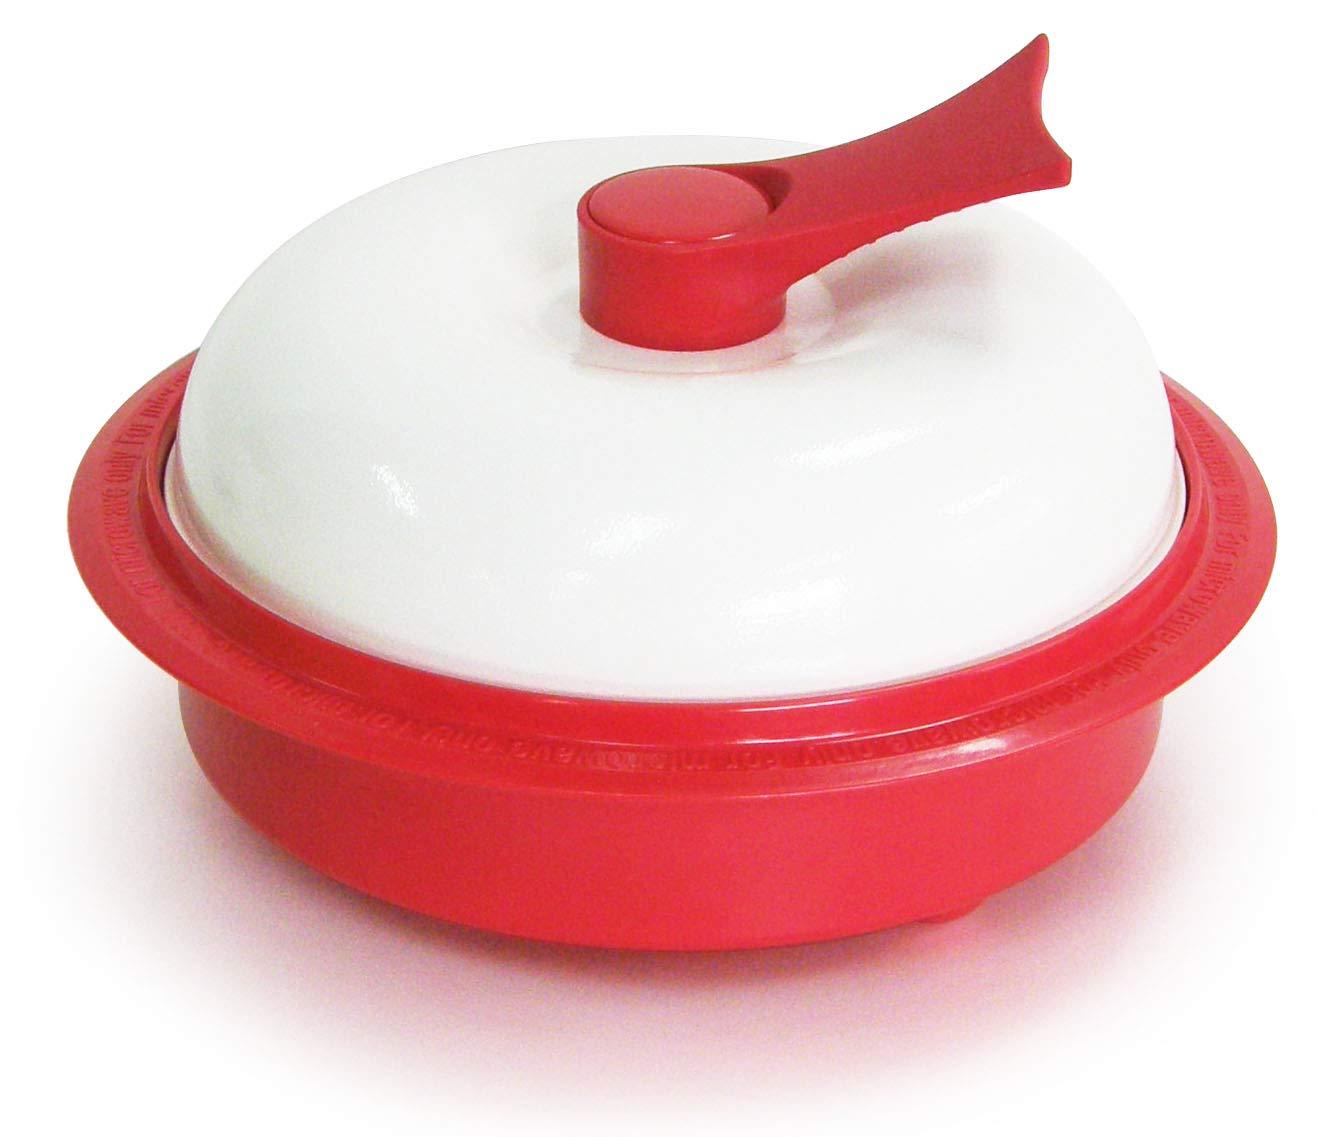 Range Mate MICROWAVEABLE COOKWARE Double Cooker